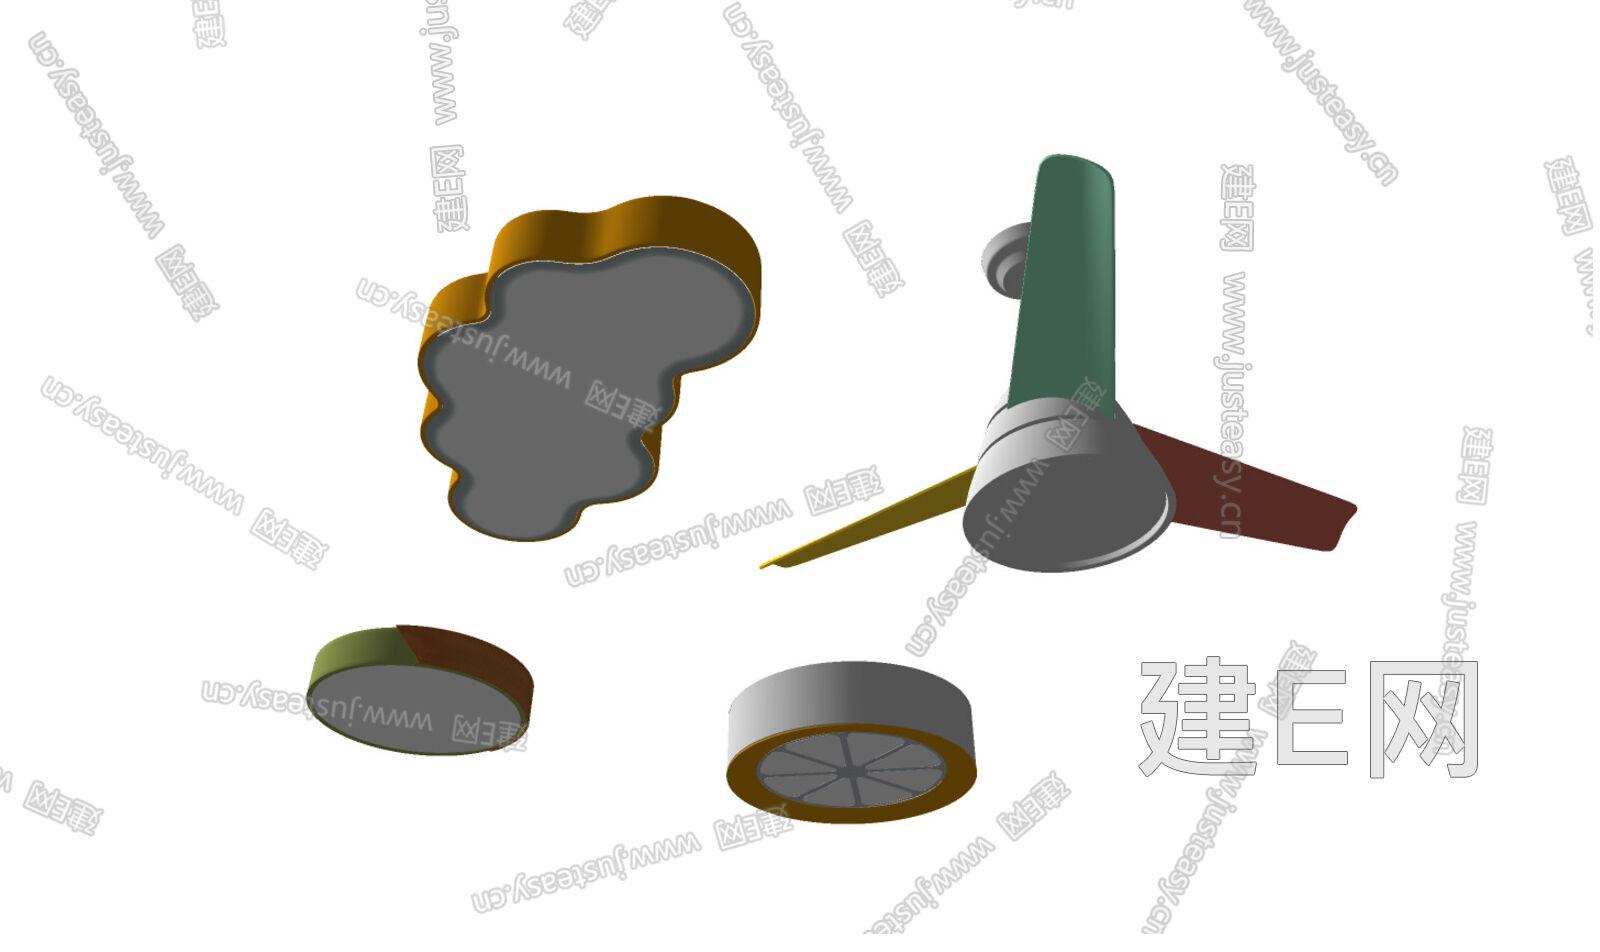 现代吸顶灯组合sketchup模型